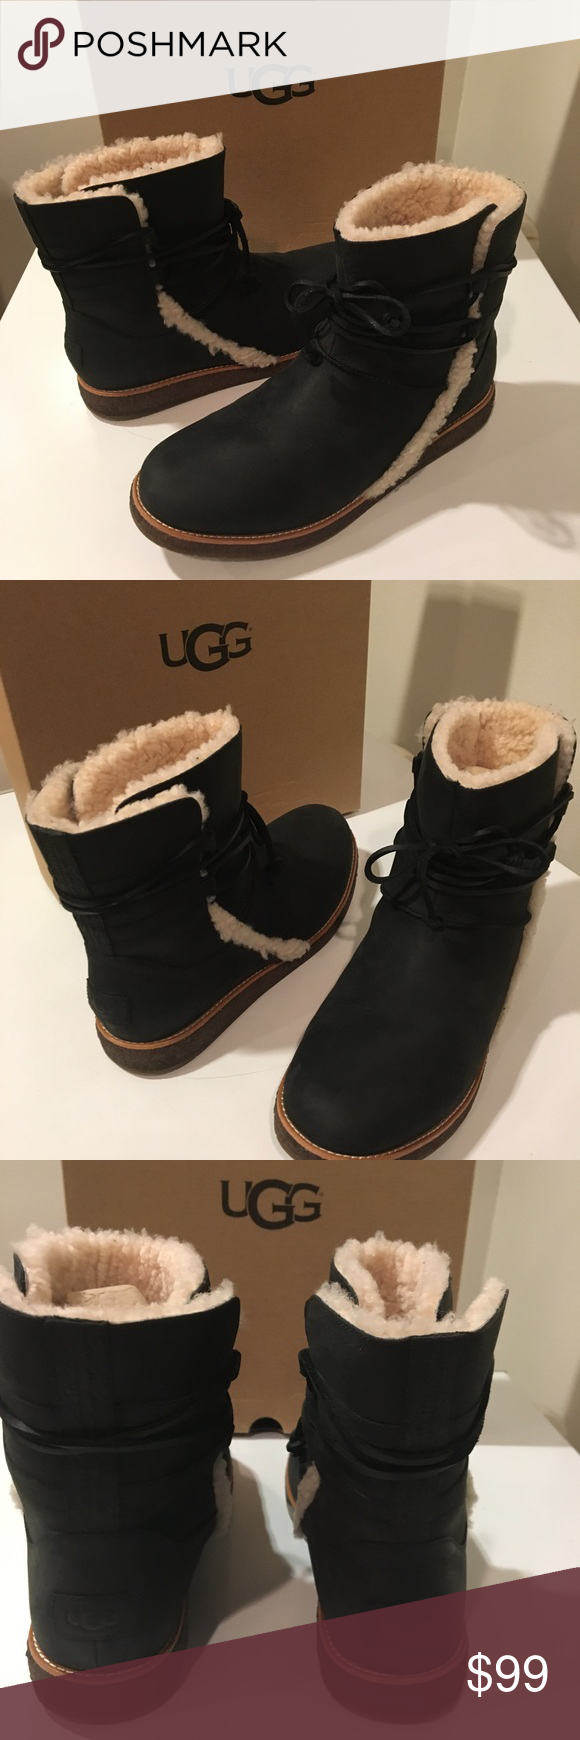 f4f34e581ae New Classic Ugg Luisa black Nubuck Leather boots❤️ Brand new ...